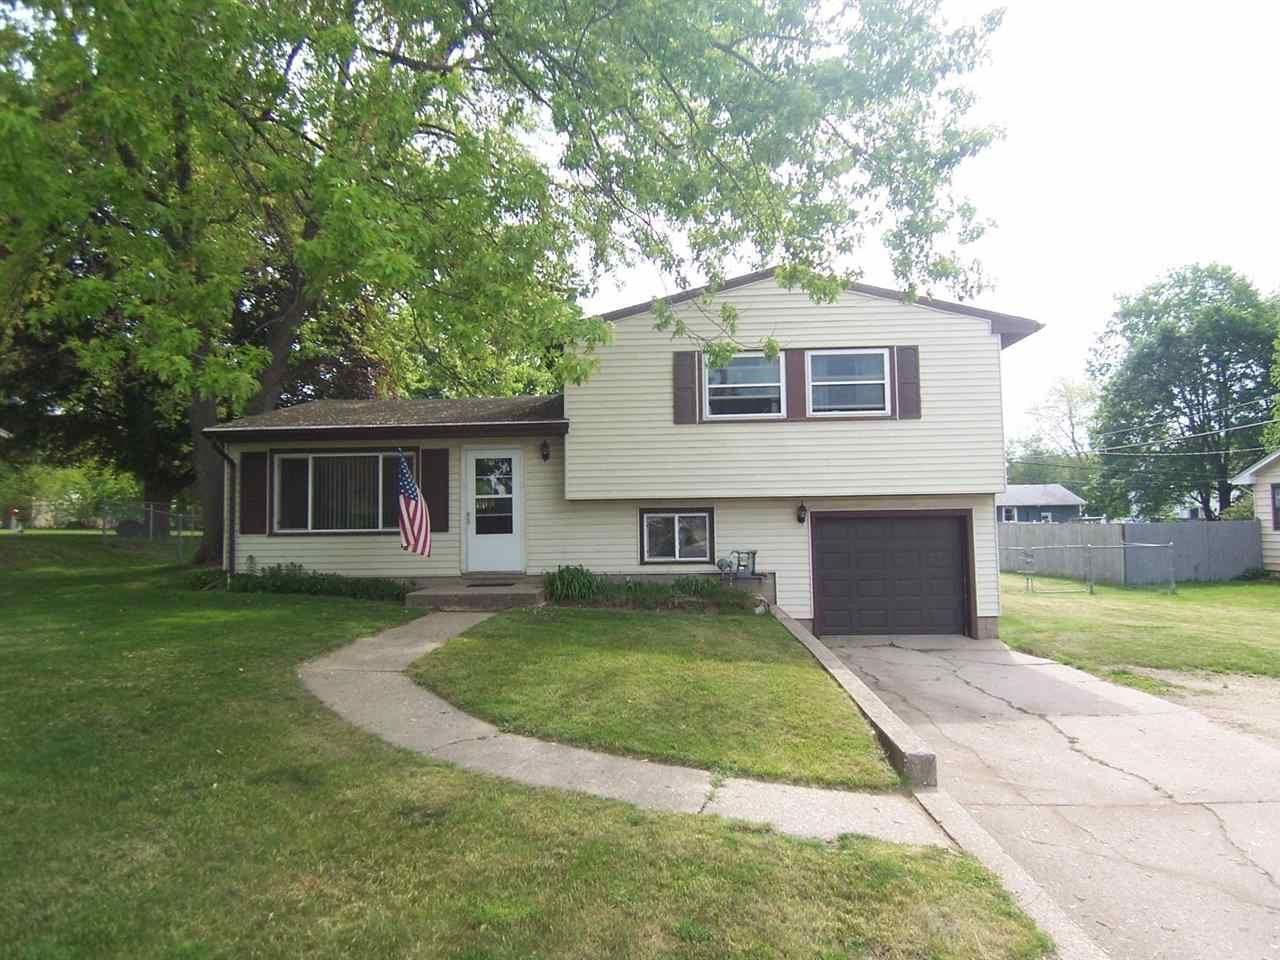 2425 Prairie Ave, Beloit, WI 53511 - #: 1909448